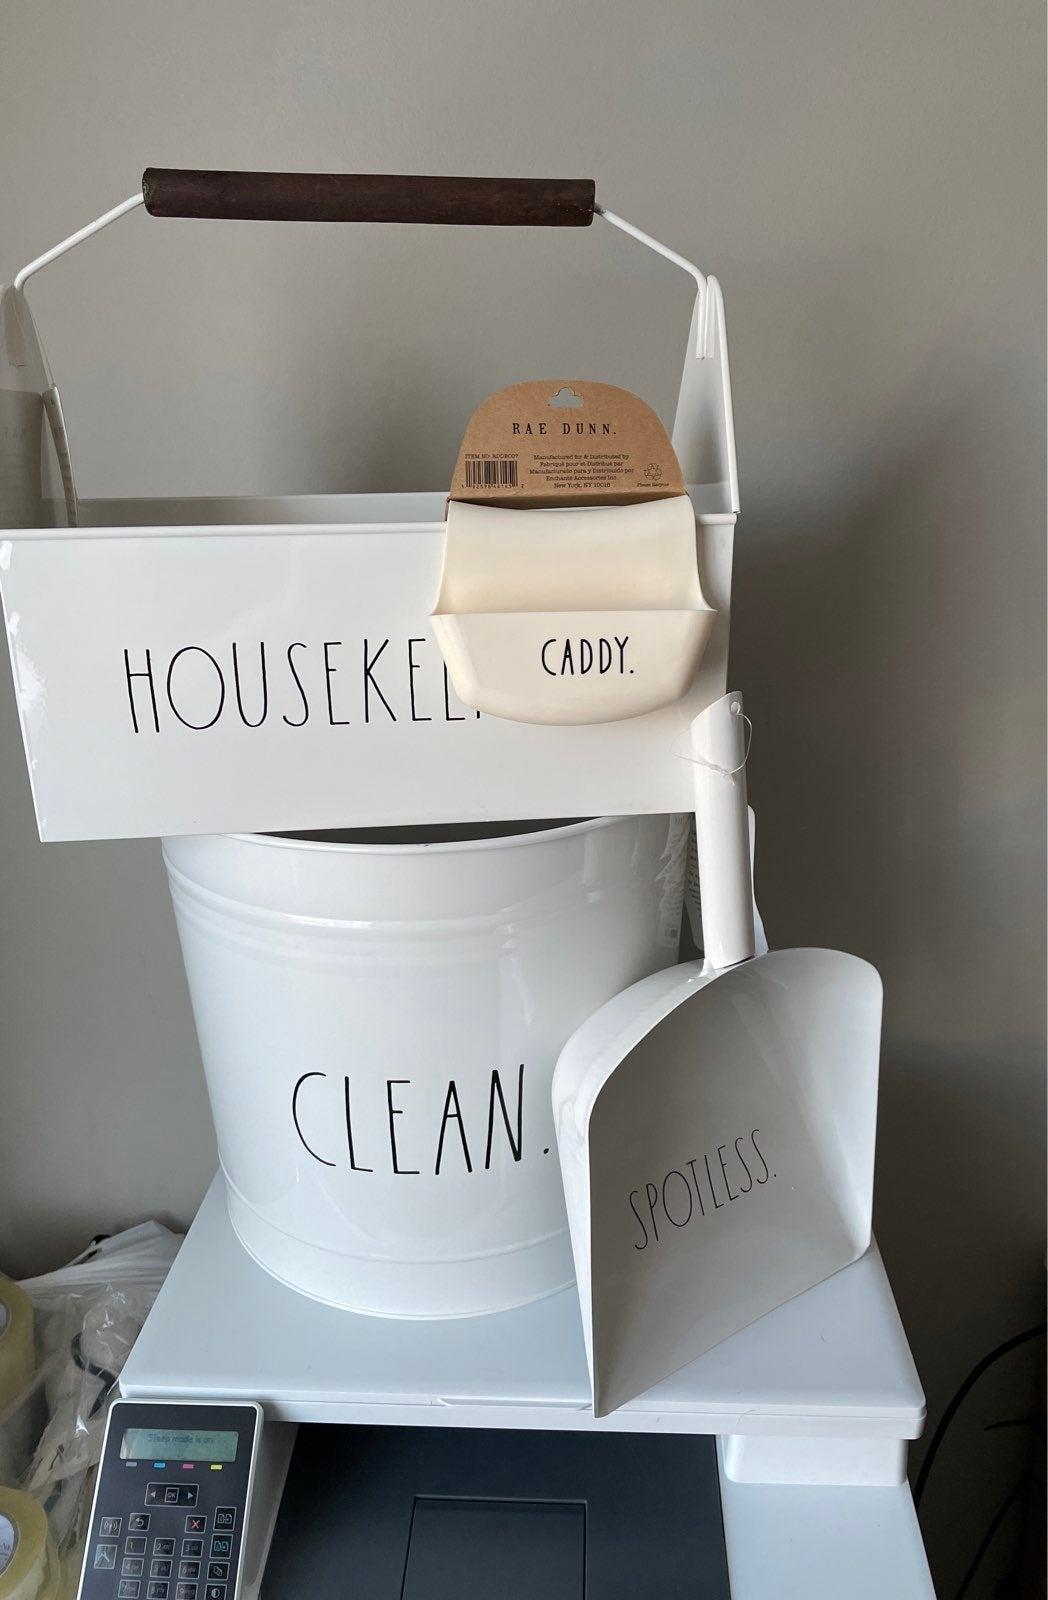 Rae Dunn housekeeping